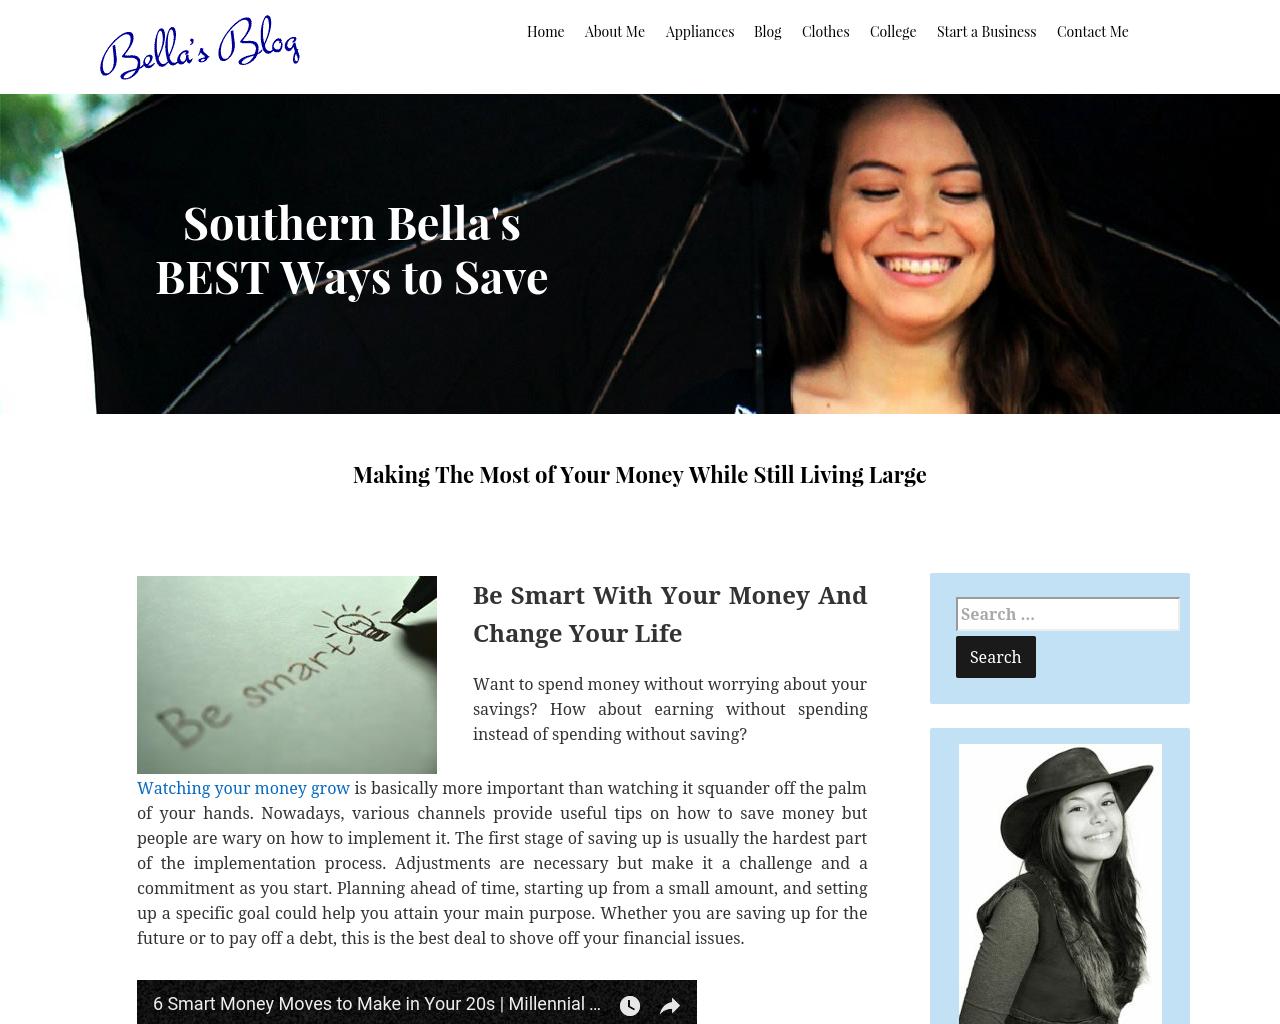 Southern-Bella's-Ways-Advertising-Reviews-Pricing